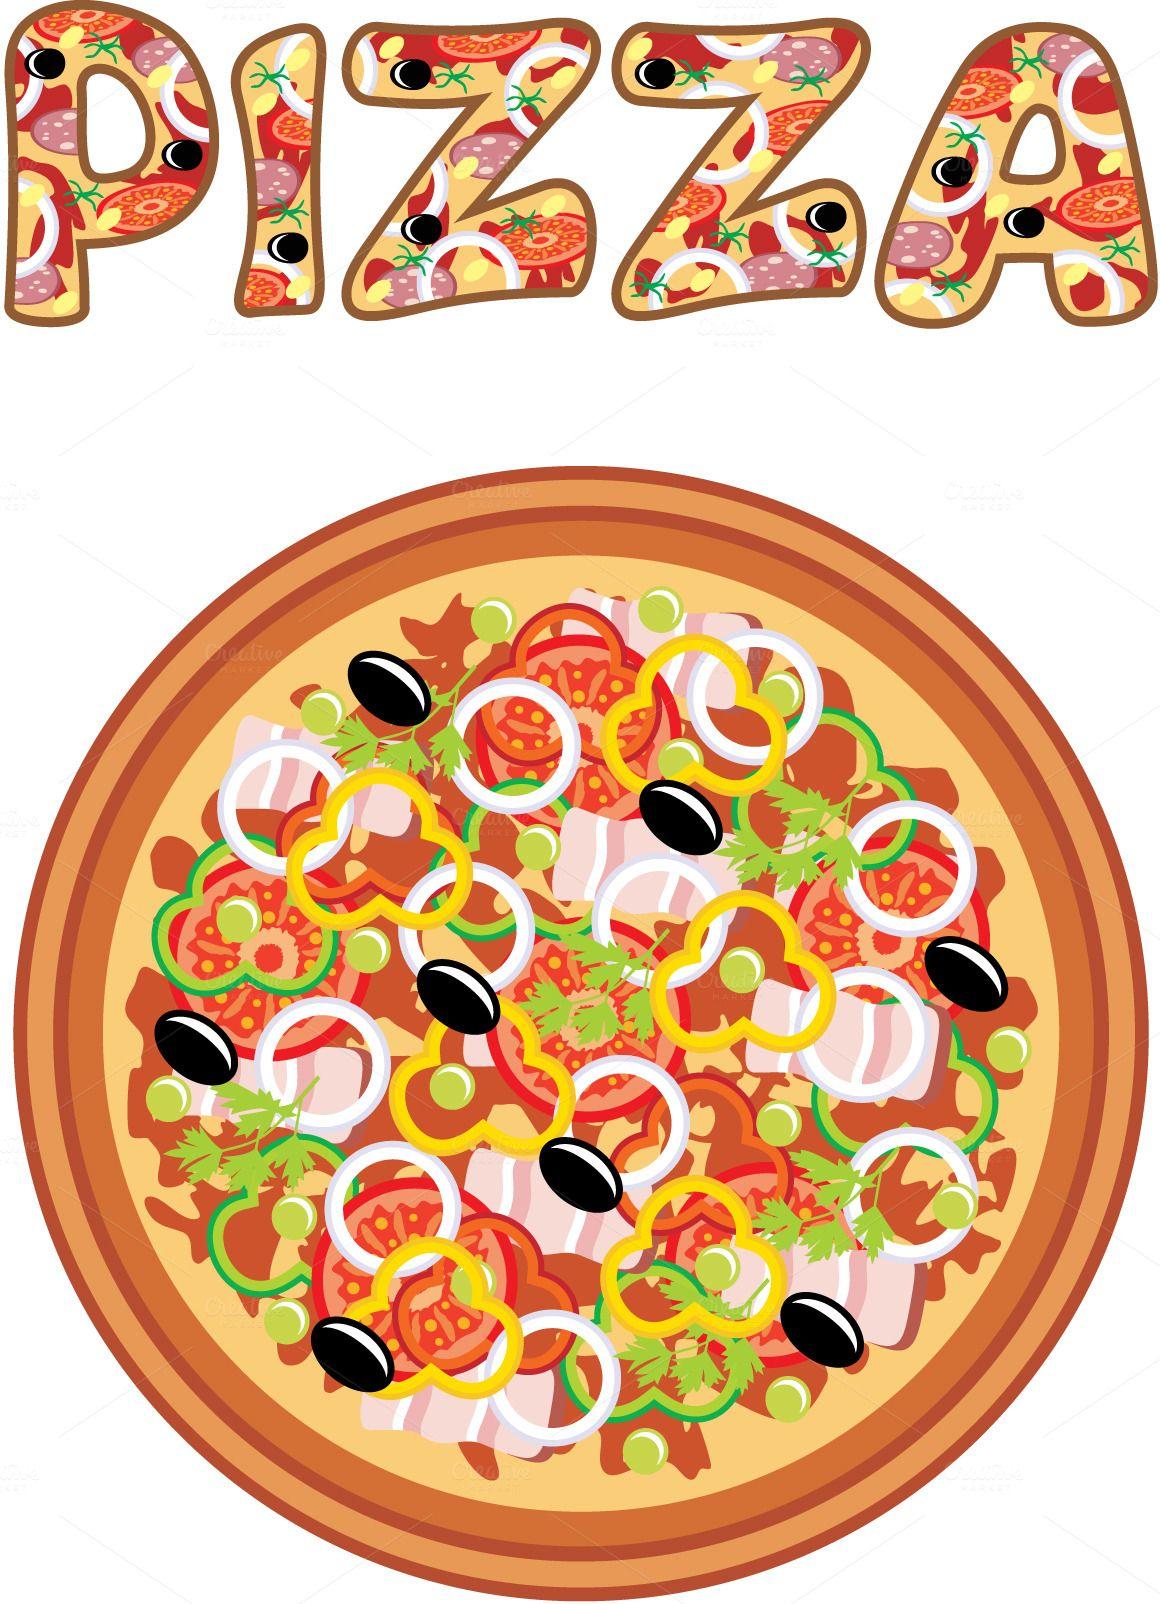 Illustrations Product Images Pizza Festa Da Pizza Noite Da Pizza Dia Da Pizza